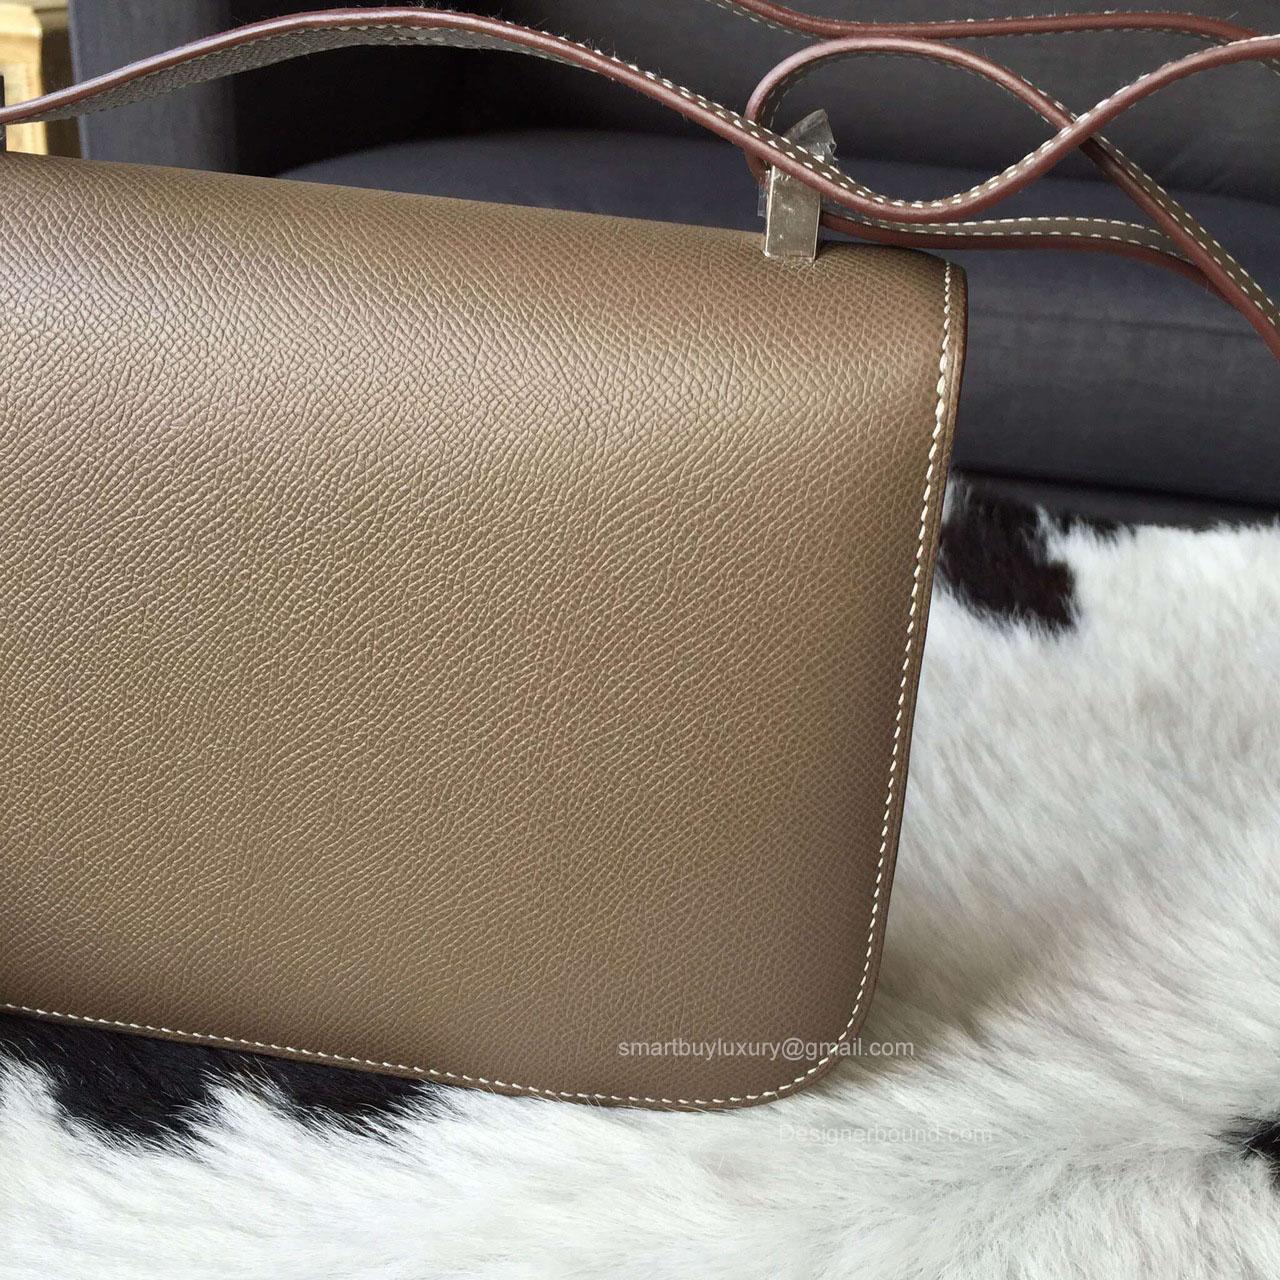 replica birkin bags - Hermes Constance 23 Bag Etoupe Epsom Leather Handstitched Silver hw -